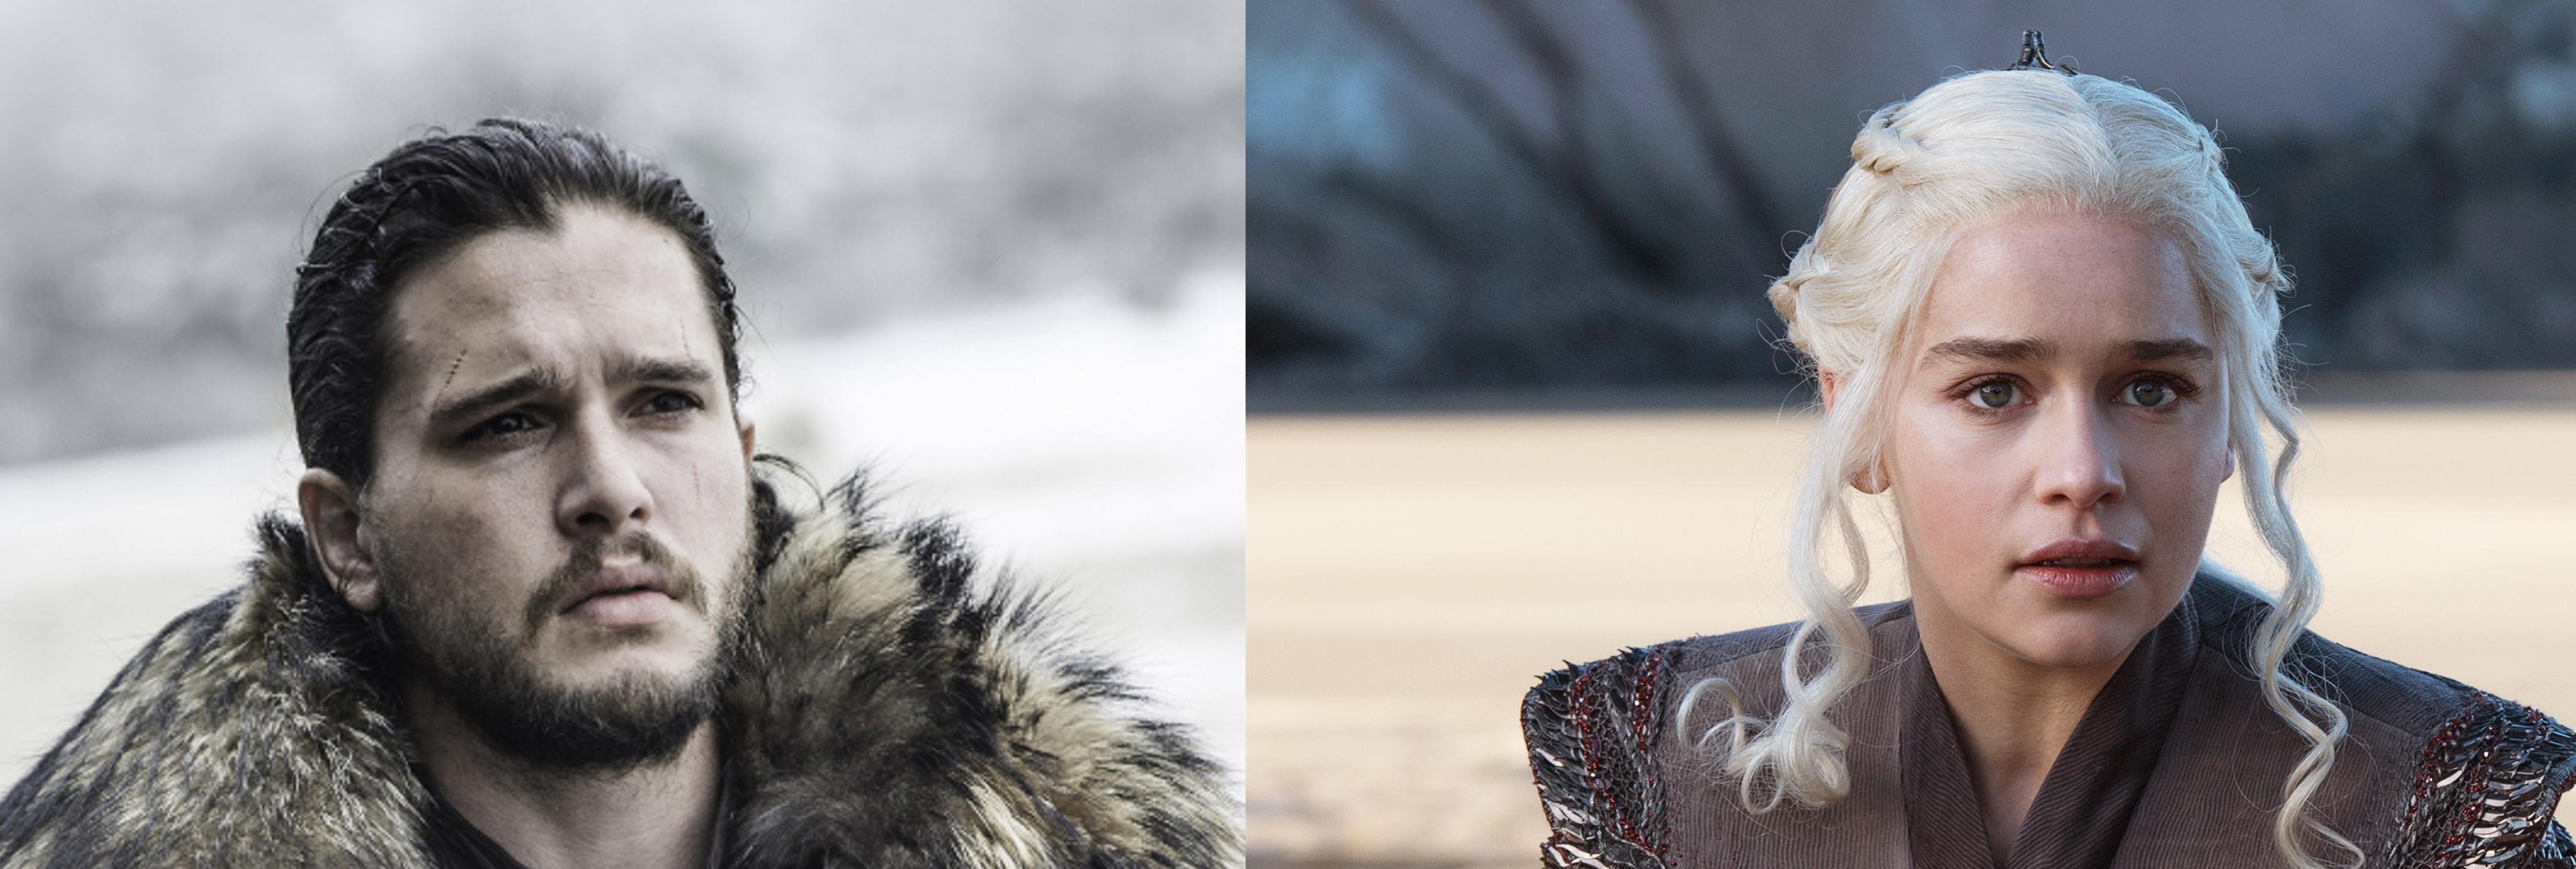 'Juego de Tronos': Jon Nieve da un pista sobre la octava temporada